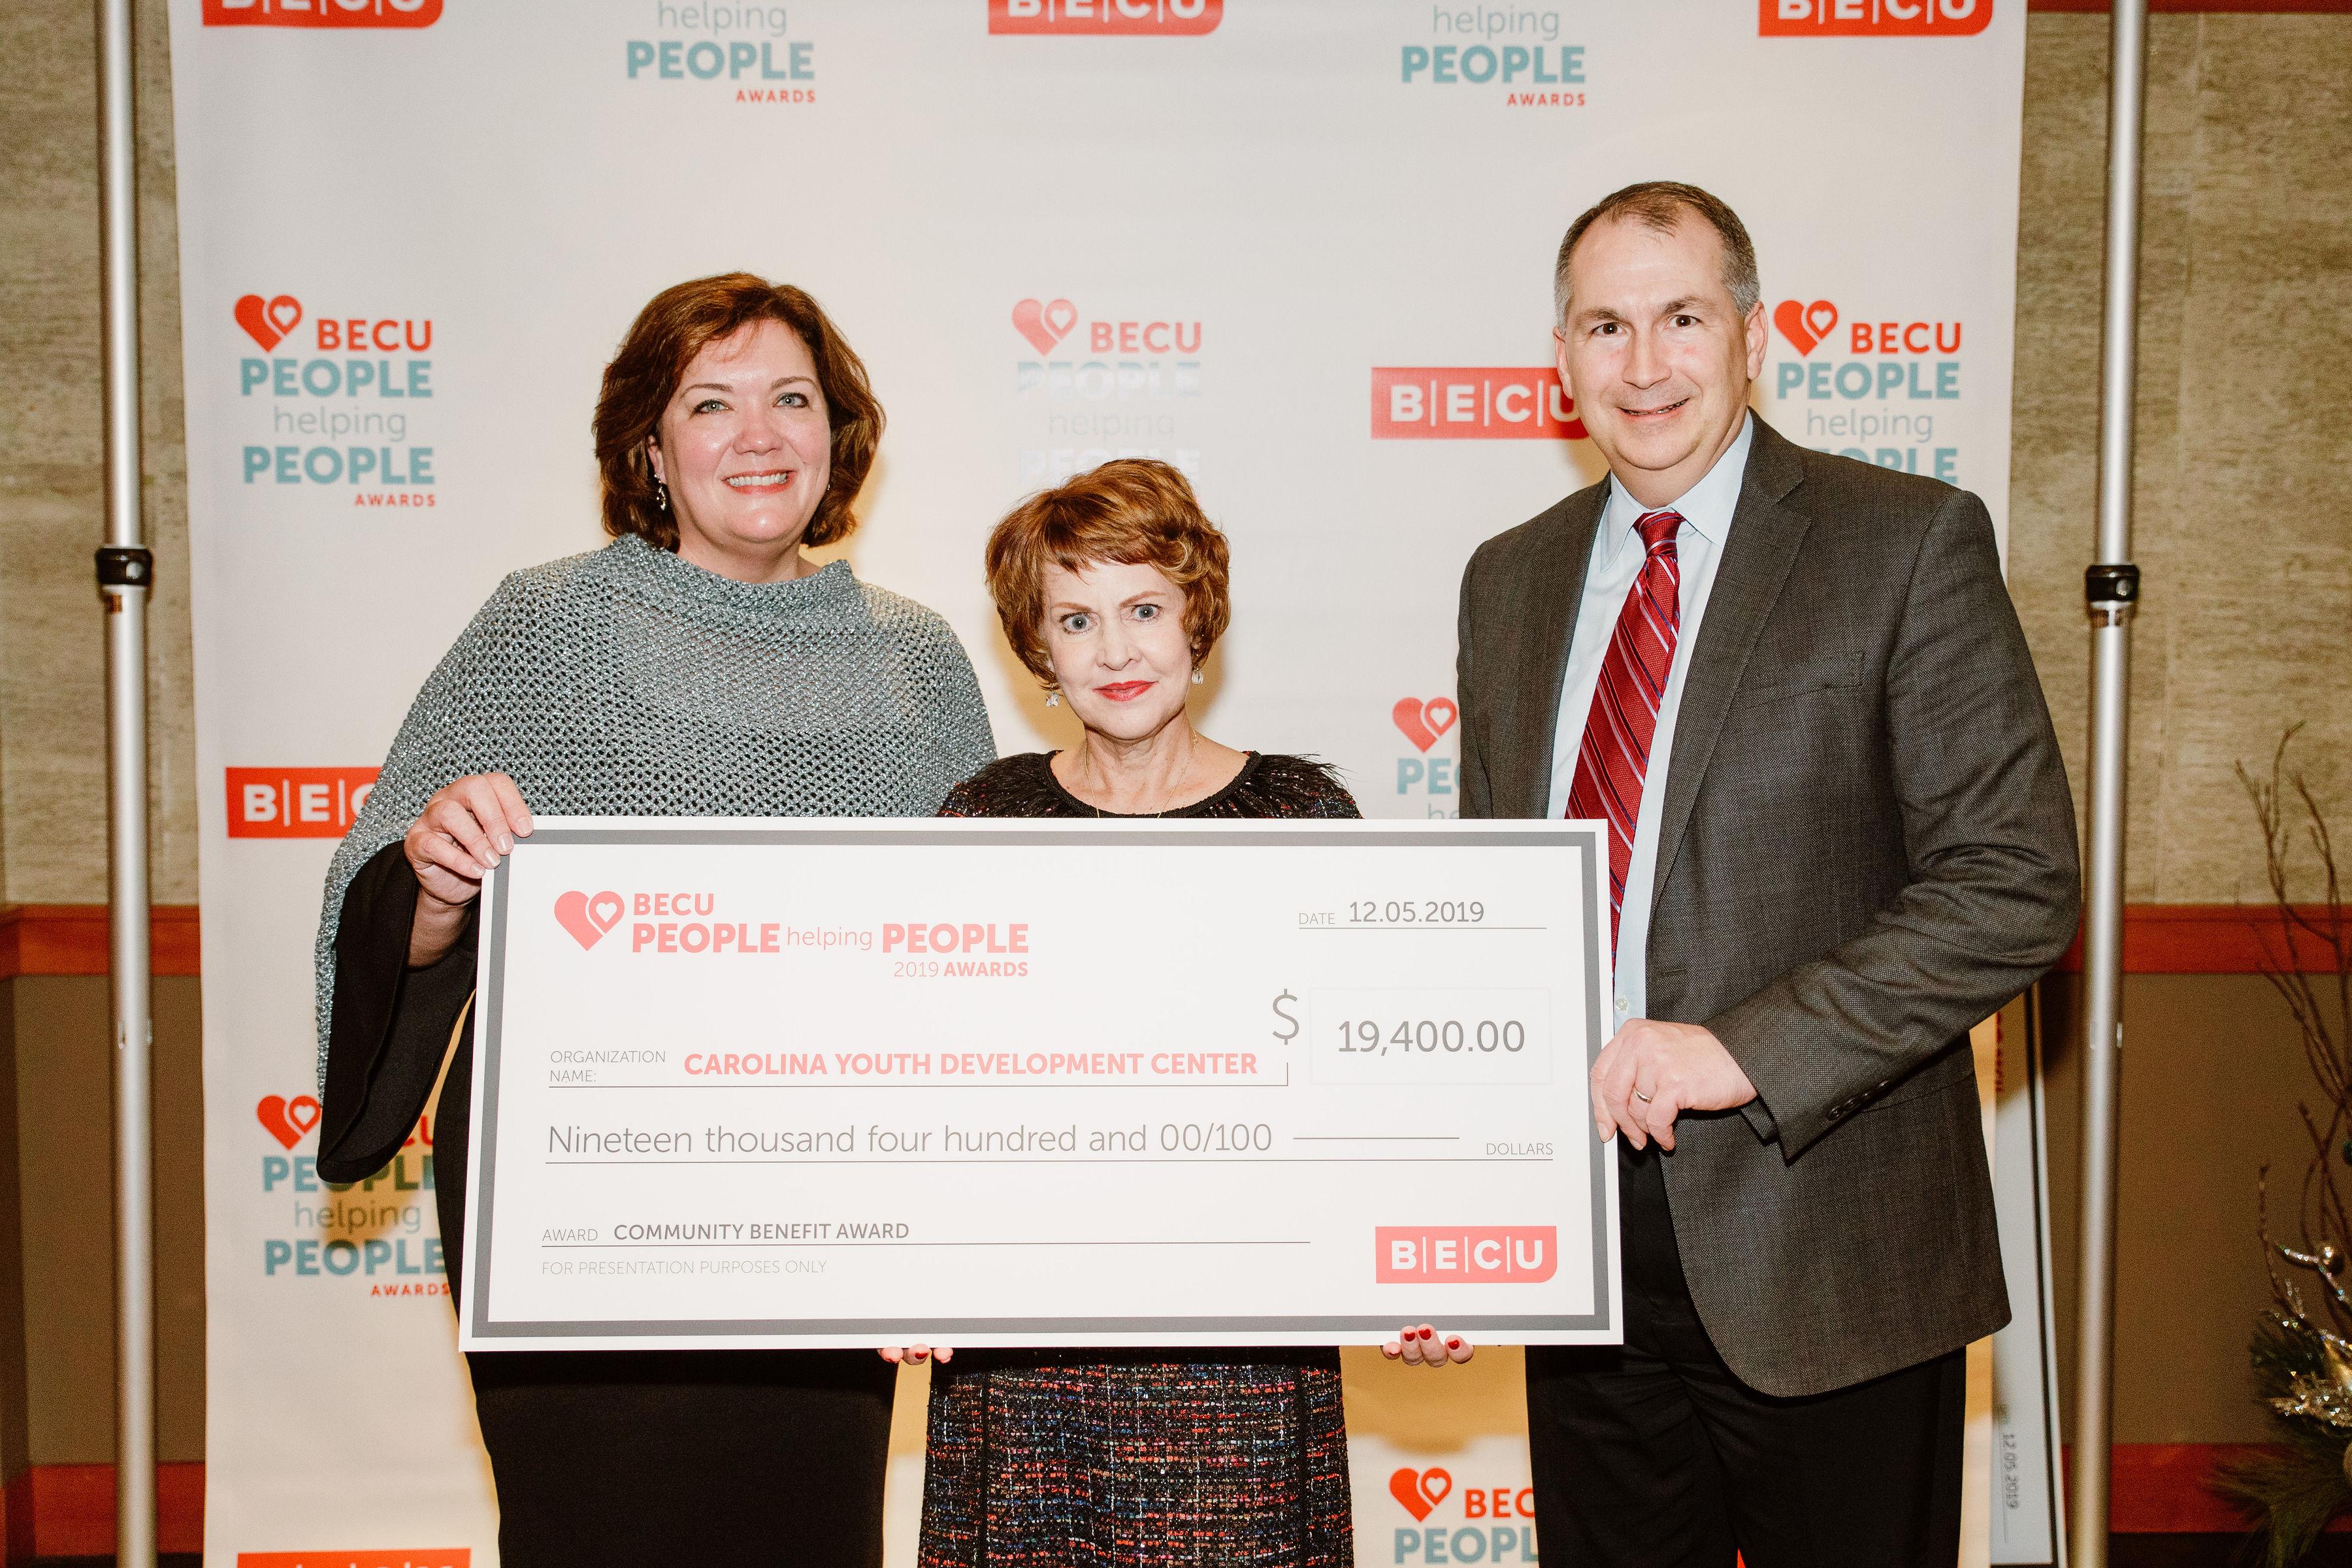 CYDC wins BECU's 2019 People Helping People Award